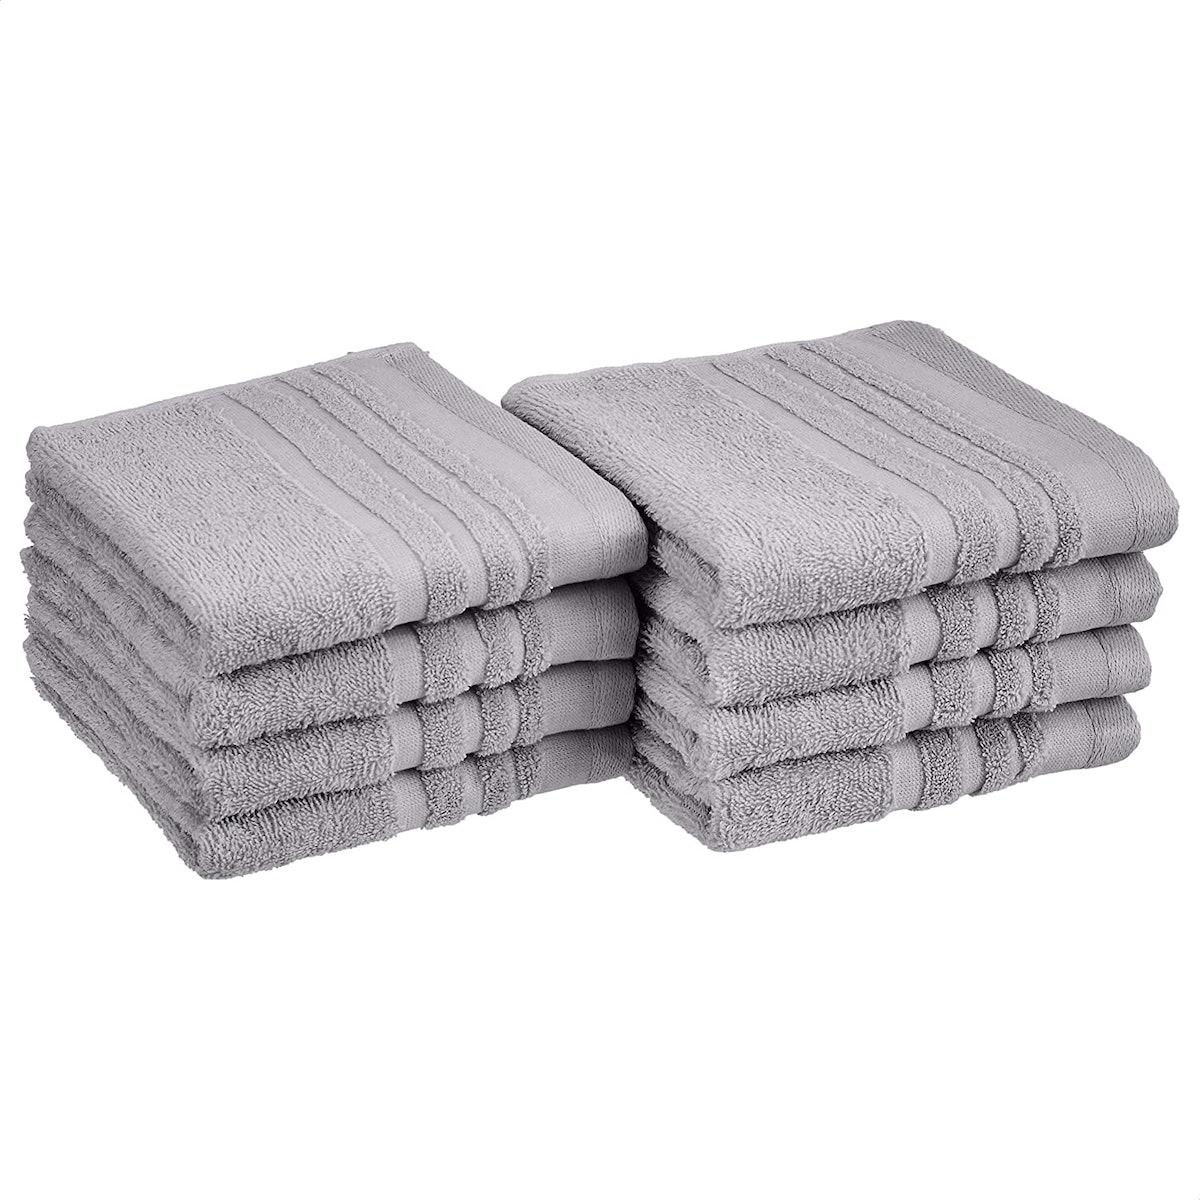 Amazon Basics Cosmetic Friendly Hand Towel (8-Pack)